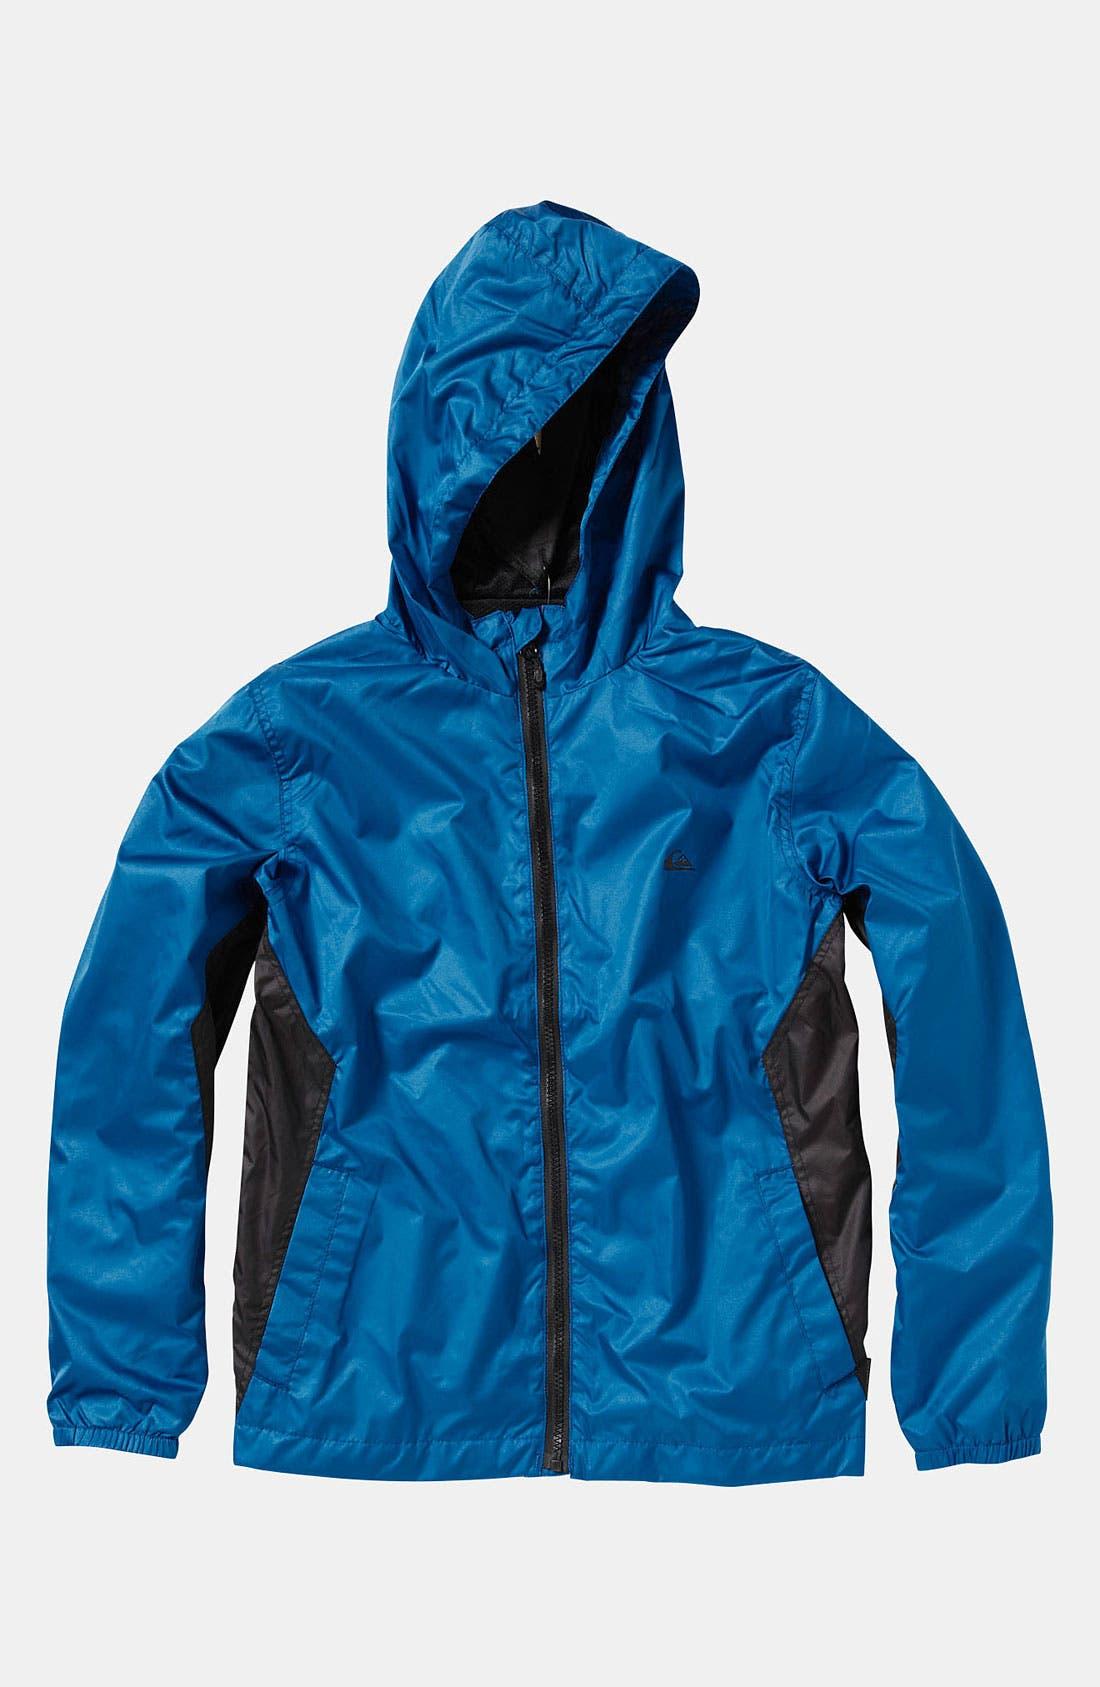 Main Image - Quiksilver 'Buddy' Windbreaker Jacket (Infant)